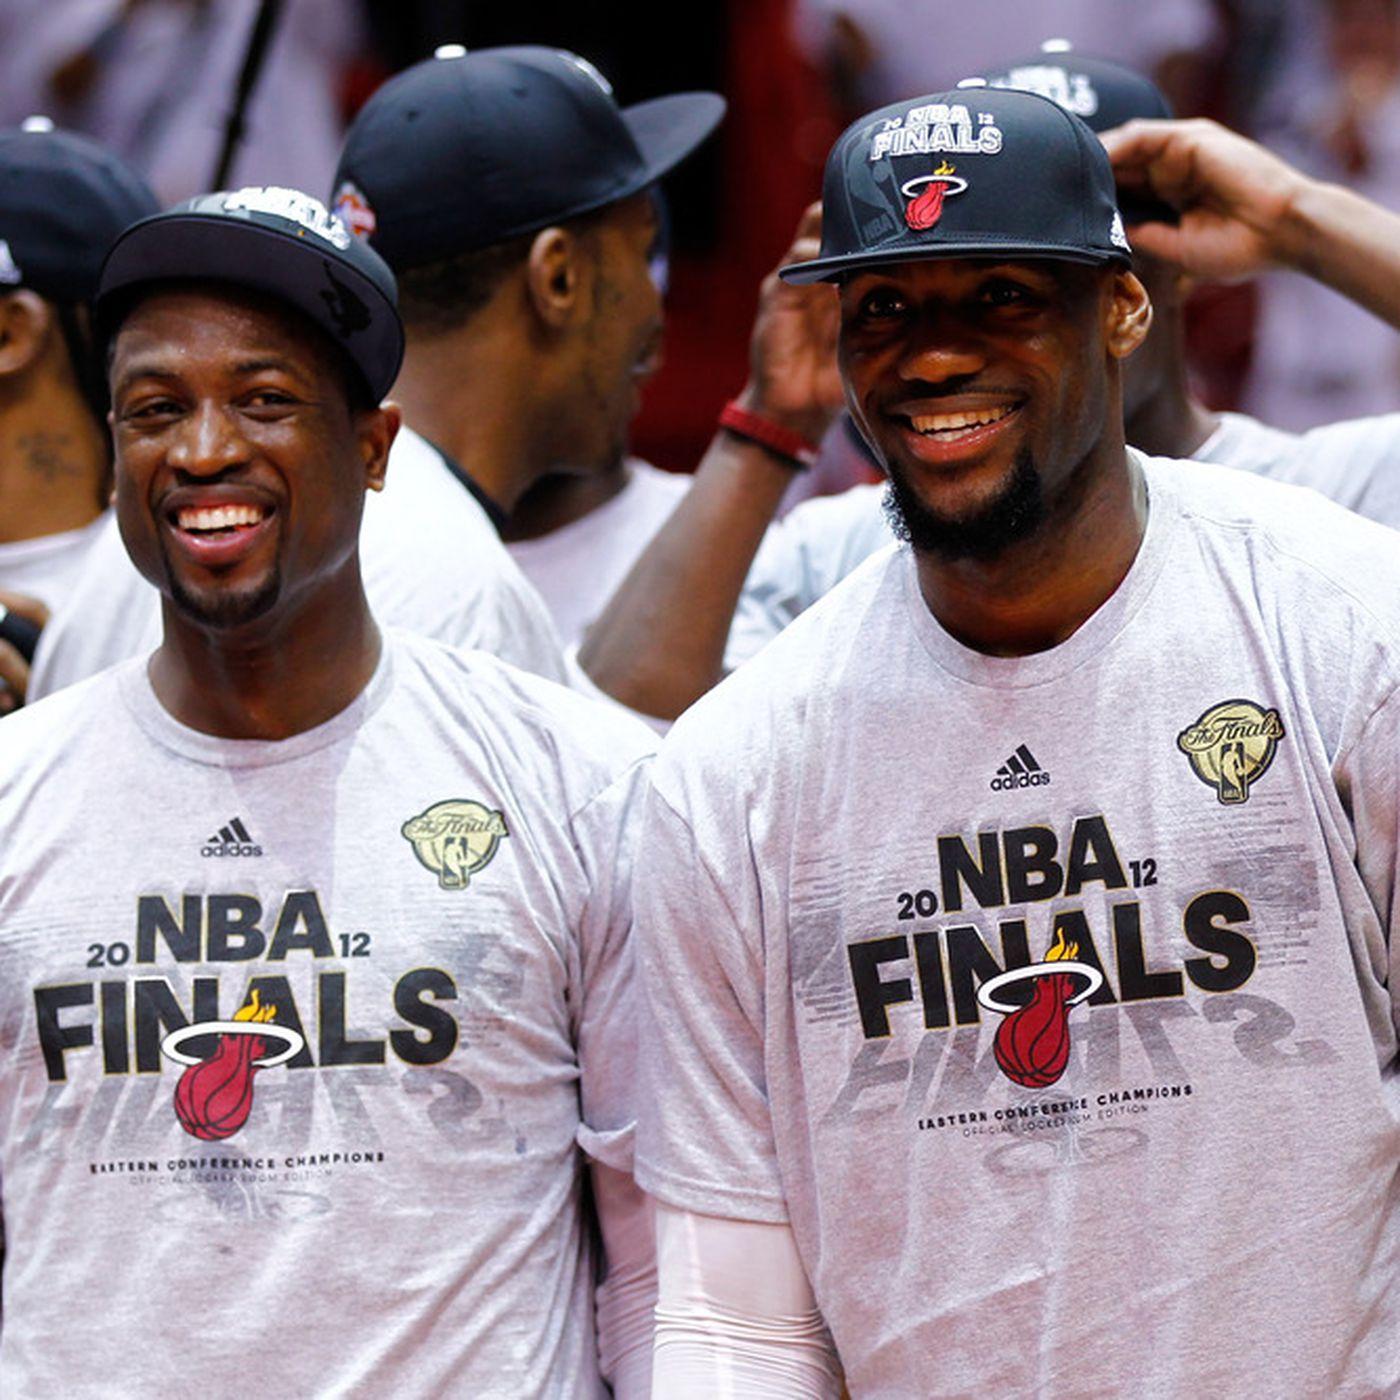 Nba Playoffs 2012 Miami Heat Defeat Boston Celtics 101 88 In Game 7 Of East Finals Sb Nation Boston